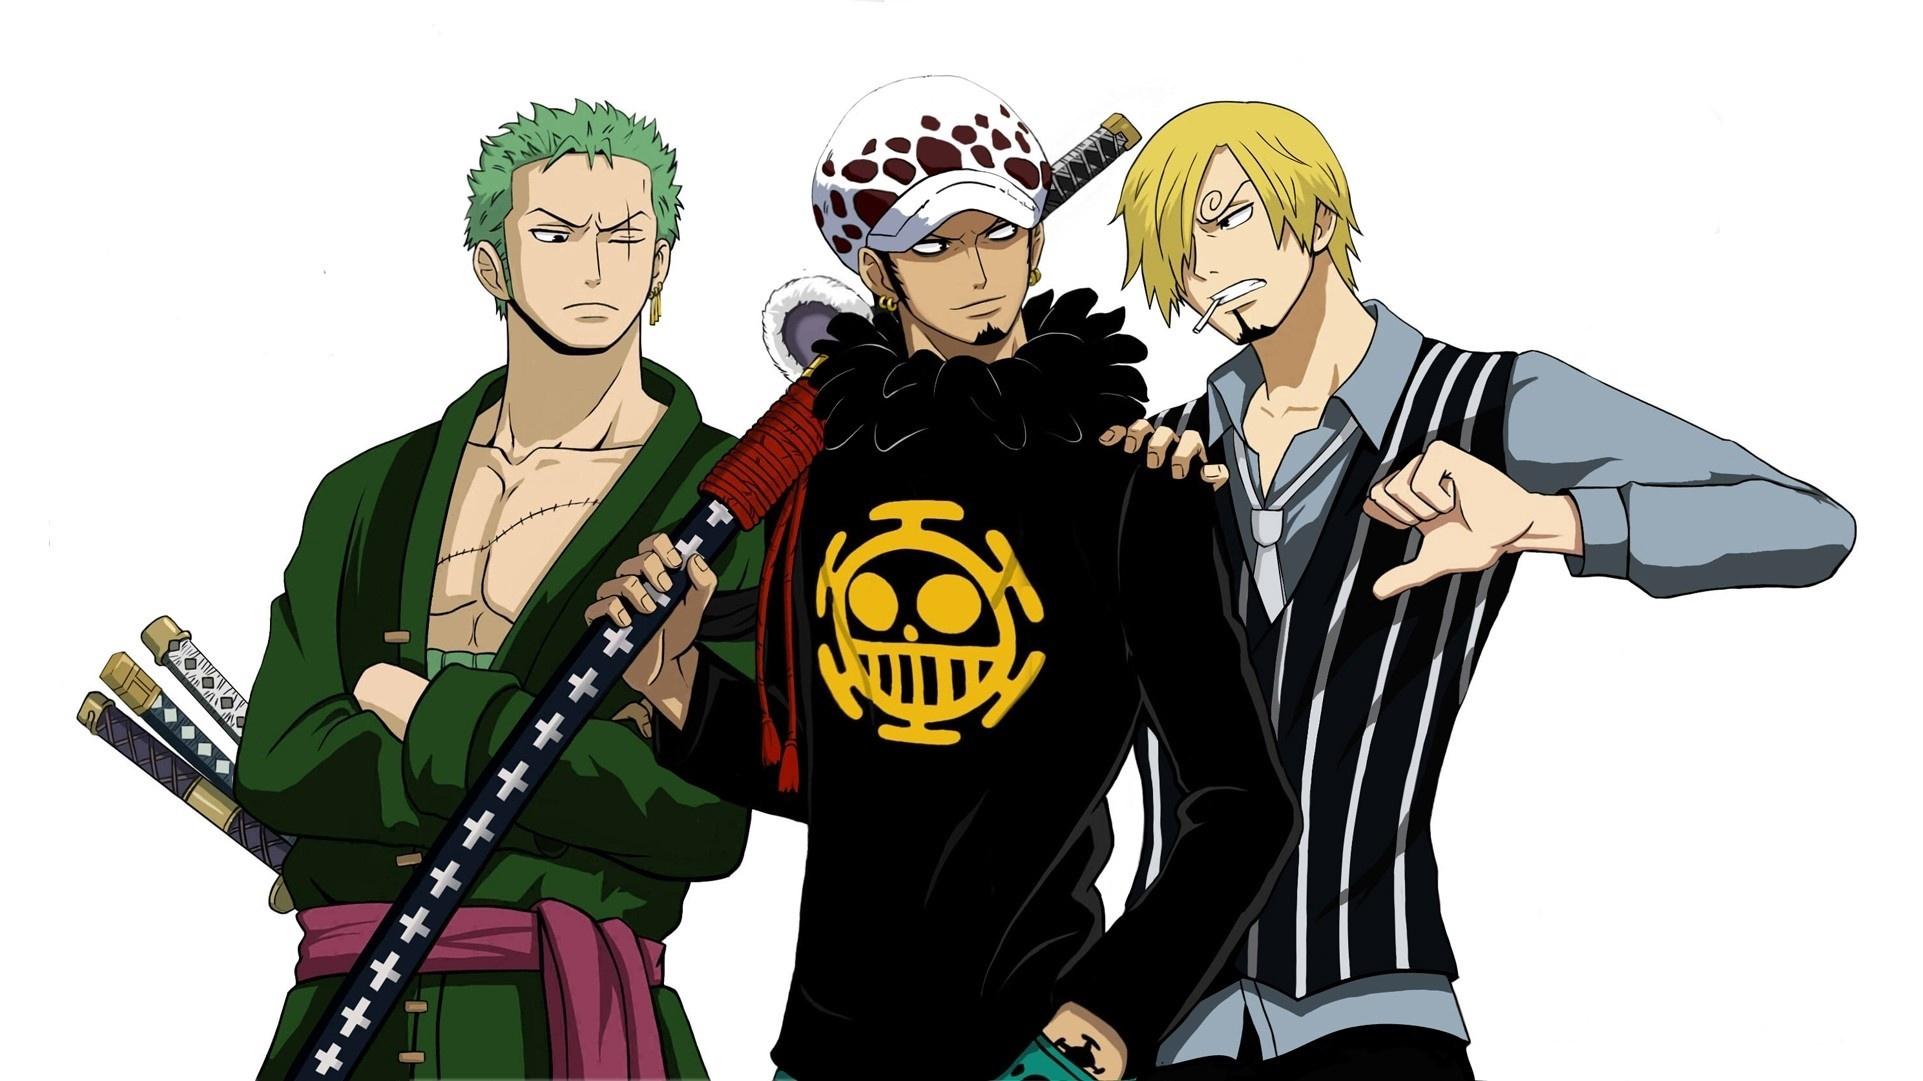 Hd wallpaper one piece zoro - Anime One Piece Zoro Roronoa Trafalgar Law Sanji One Piece Wallpaper